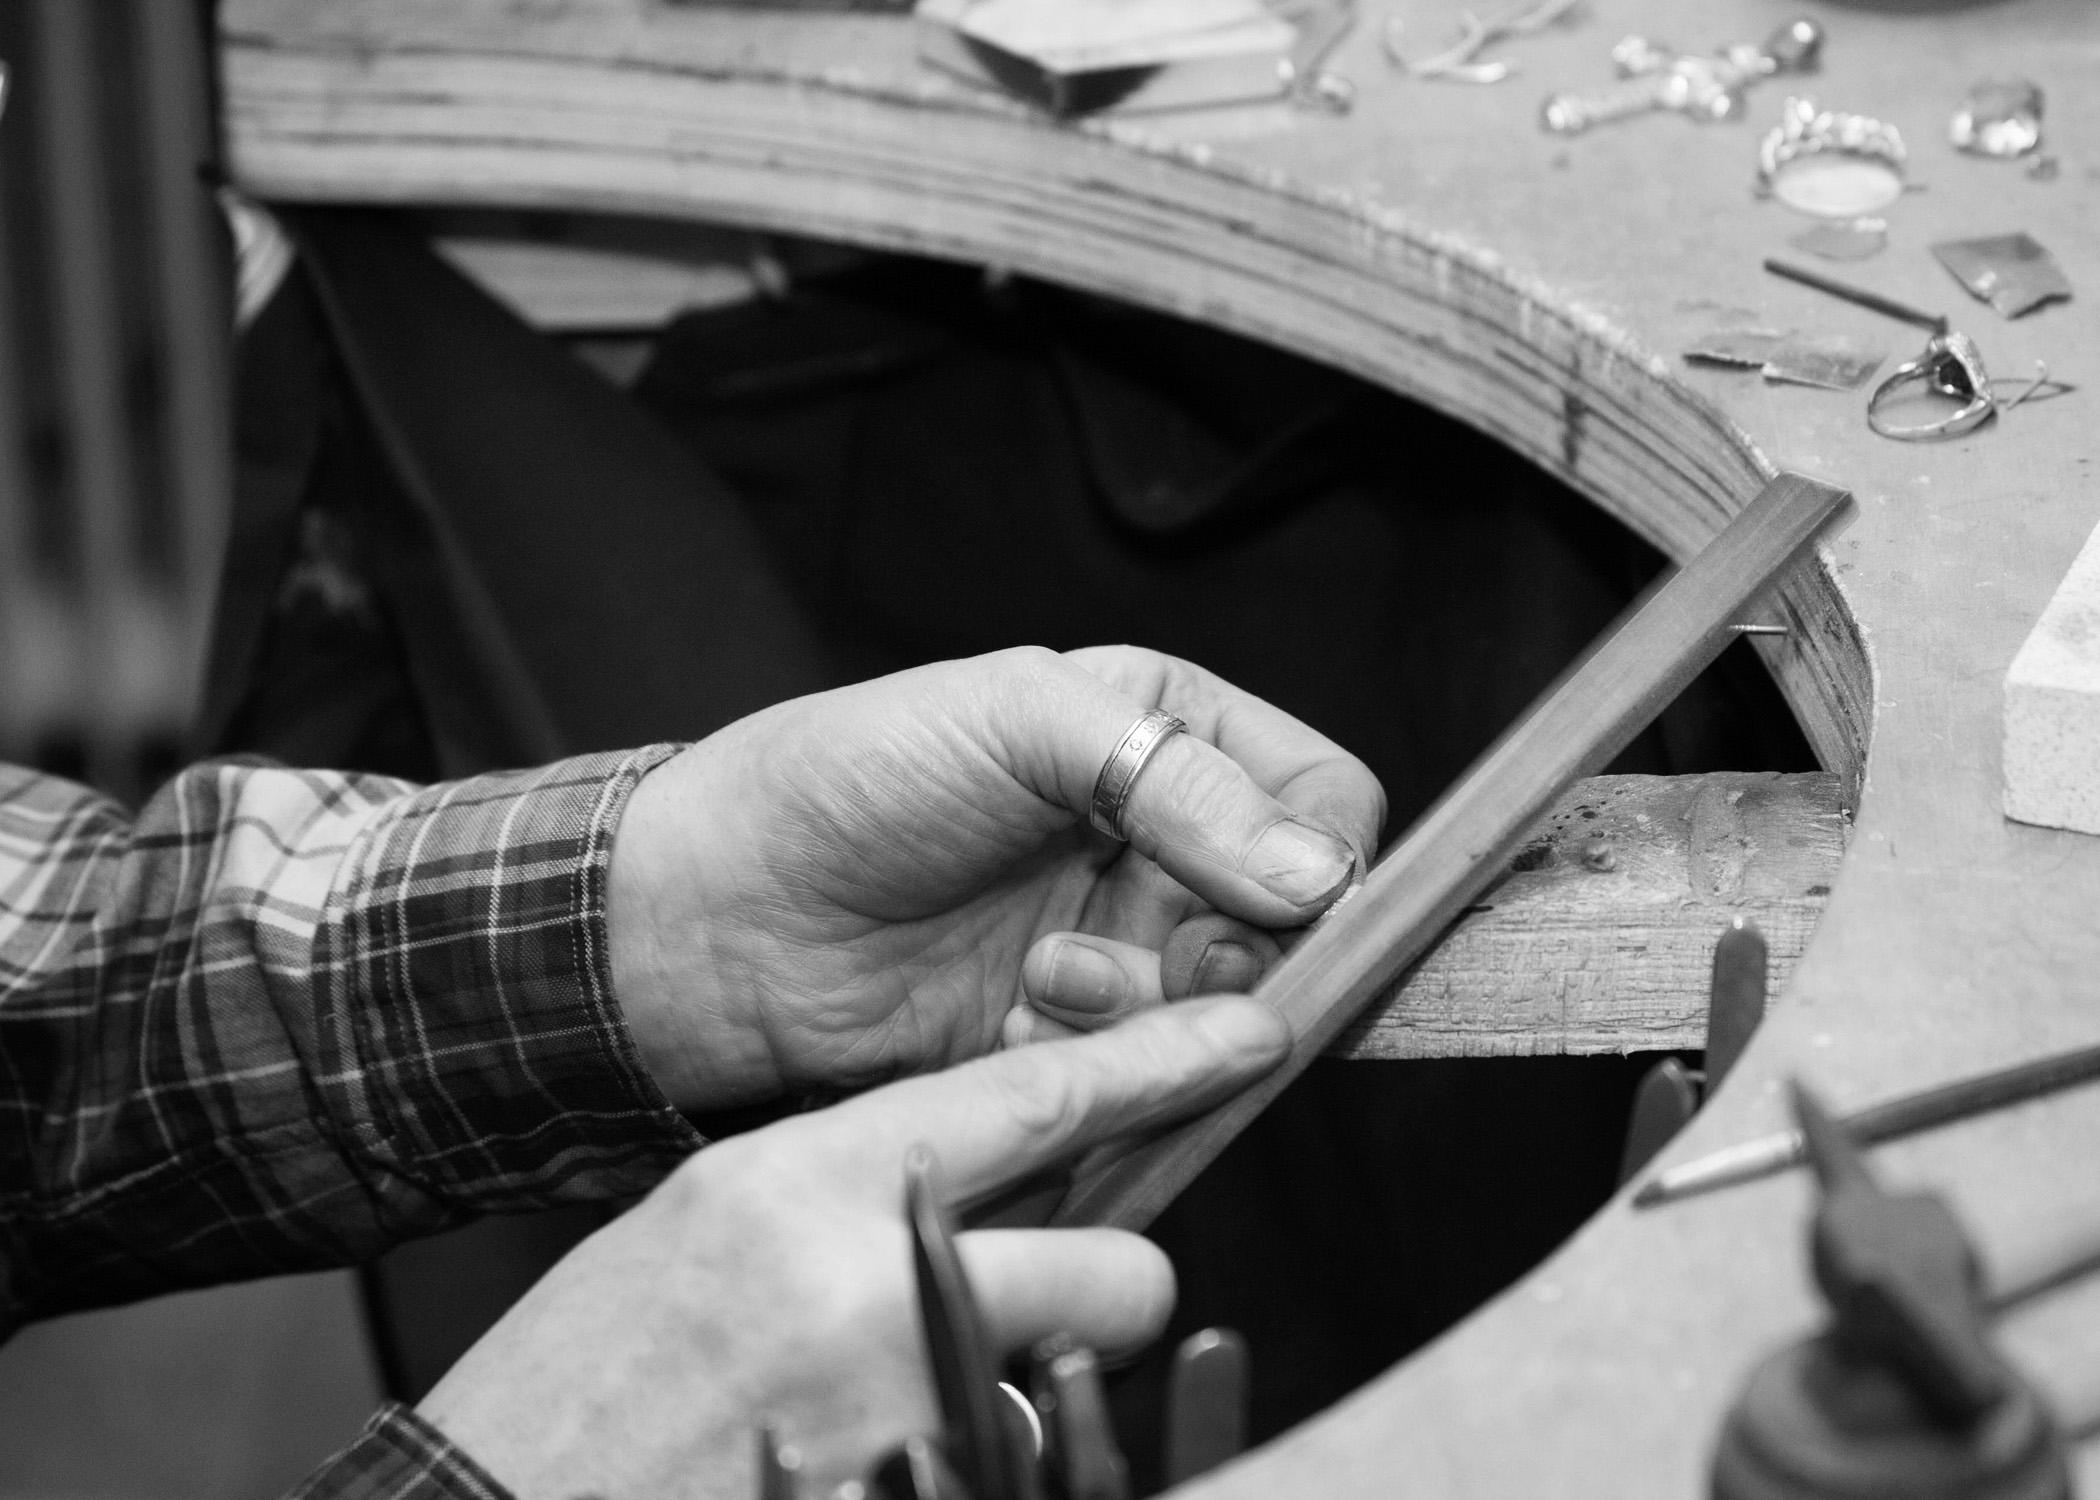 LuLu & Charles Jewellery workshop based in County Durham, uk